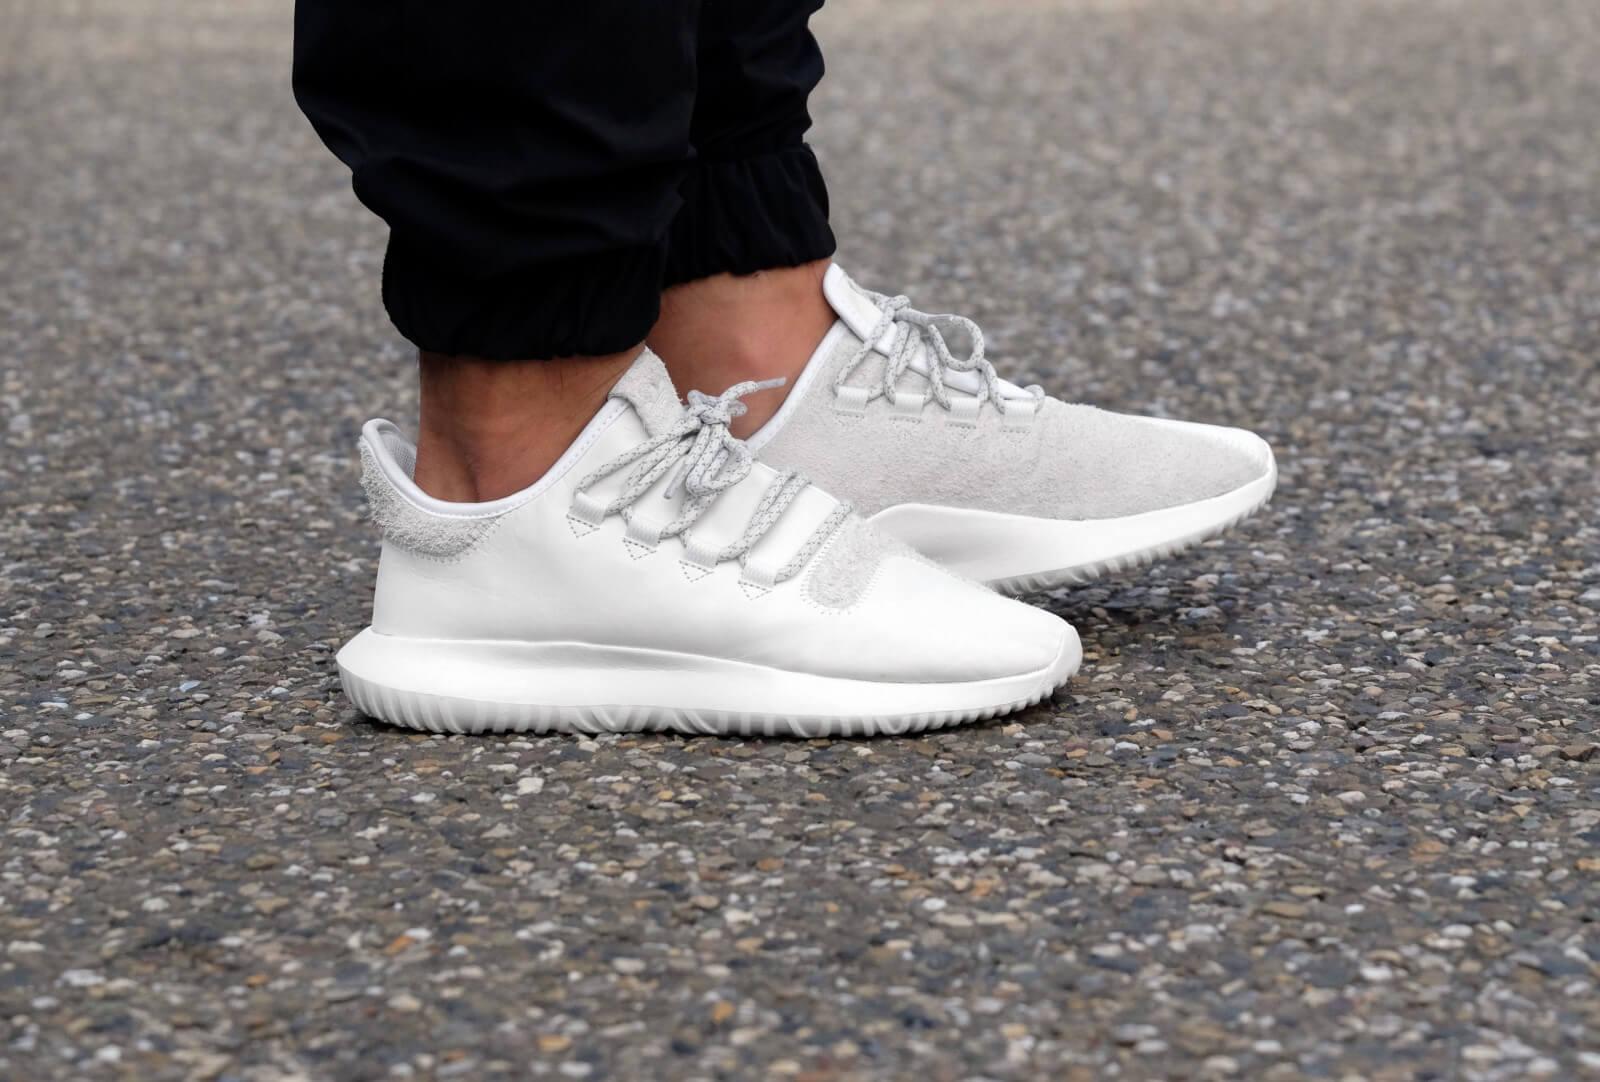 adidas tubular shadow white on sale > OFF58% Discounted